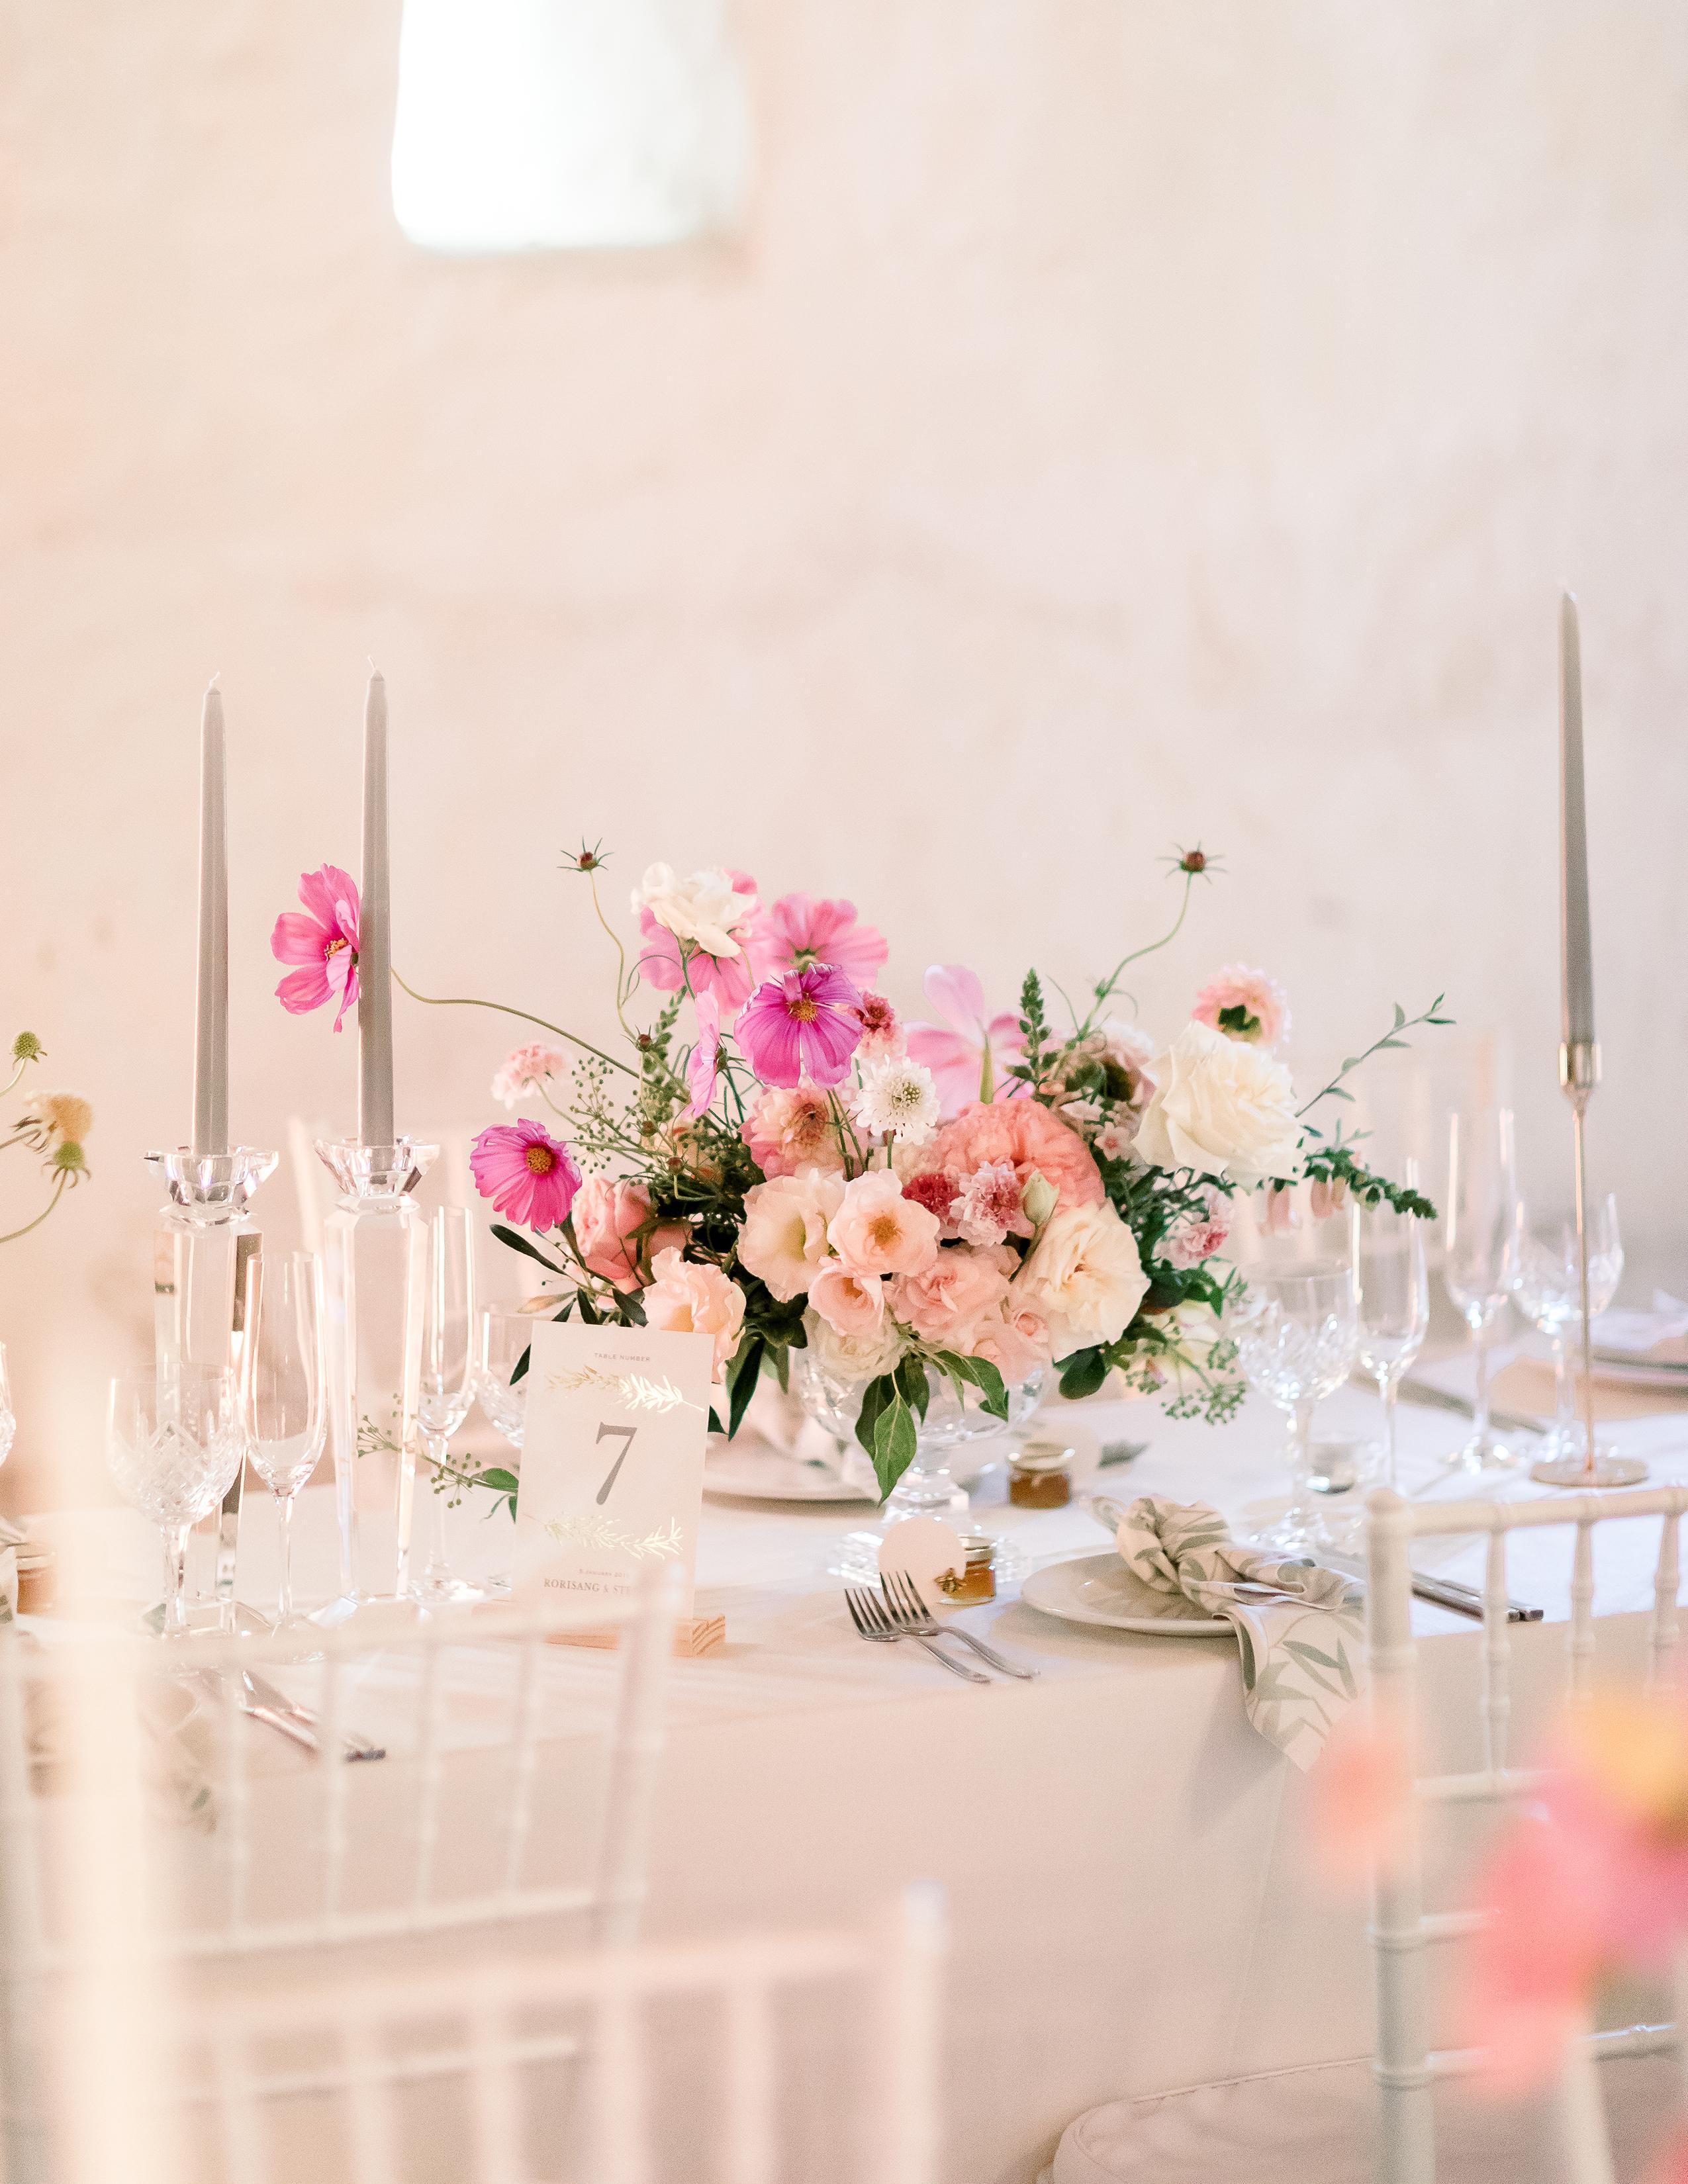 rorisang stephen wedding reception wine cellar